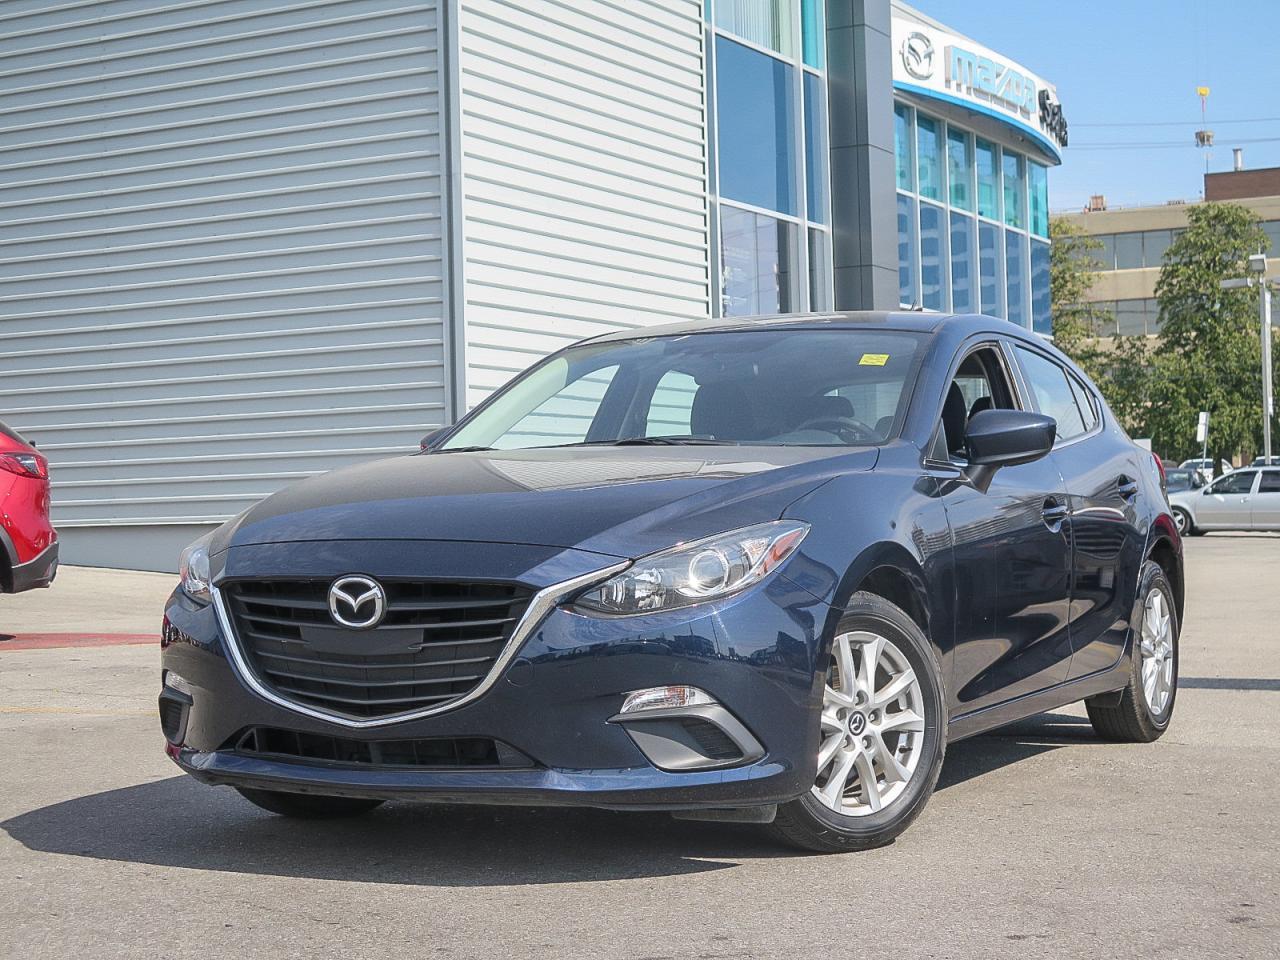 2014 Mazda MAZDA3 GS SKY HEATED SEATS 0.65% FINANCE!!!